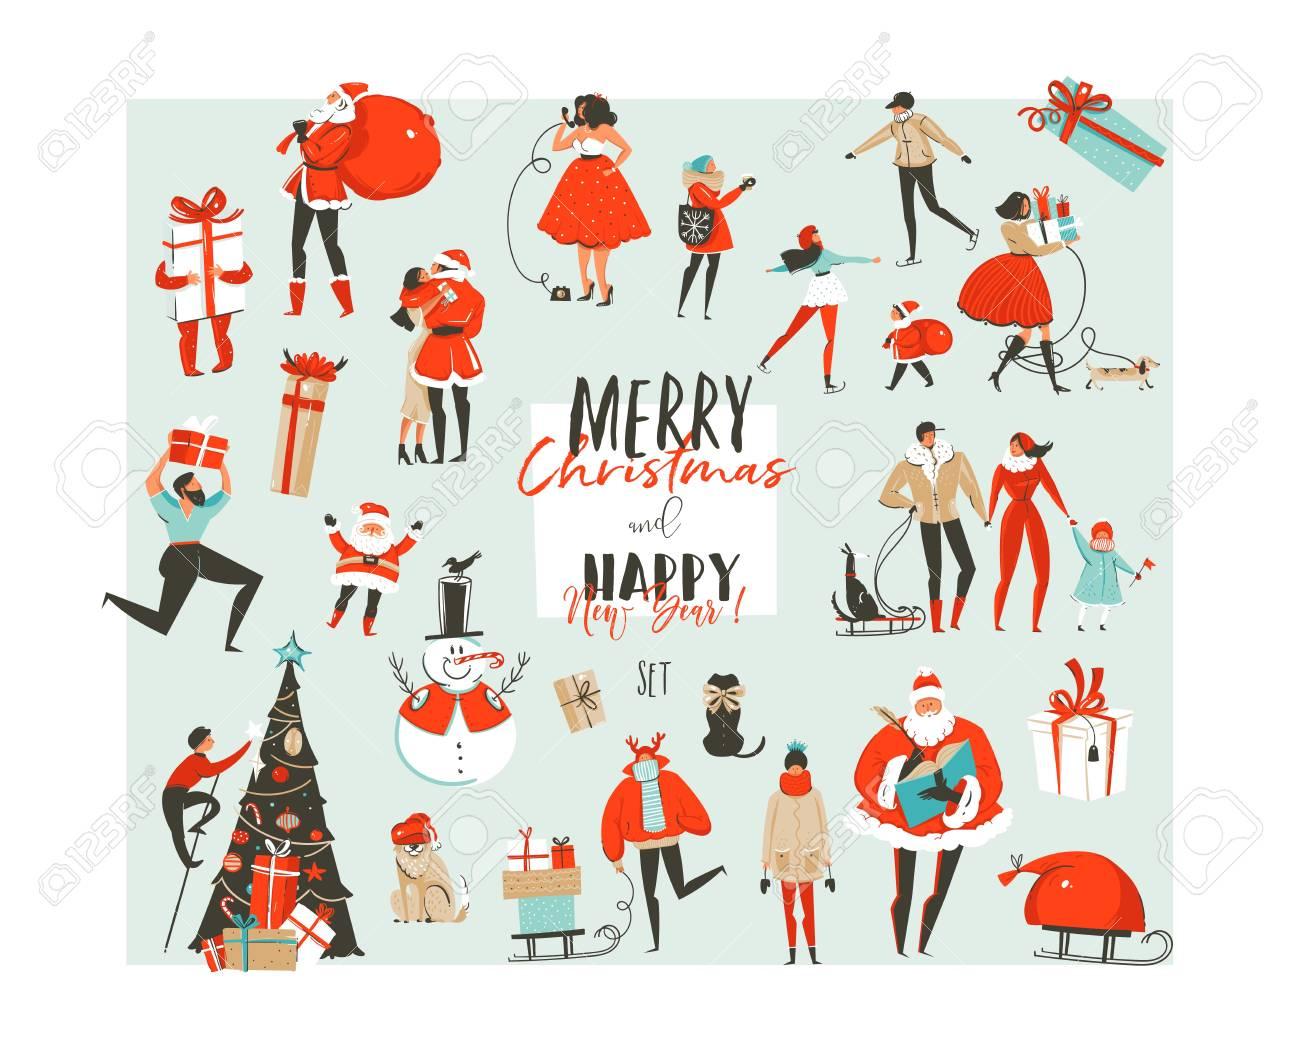 Resumo De Mao Desenhada Vetor Feliz Natal E Feliz Ano Novo Tempo